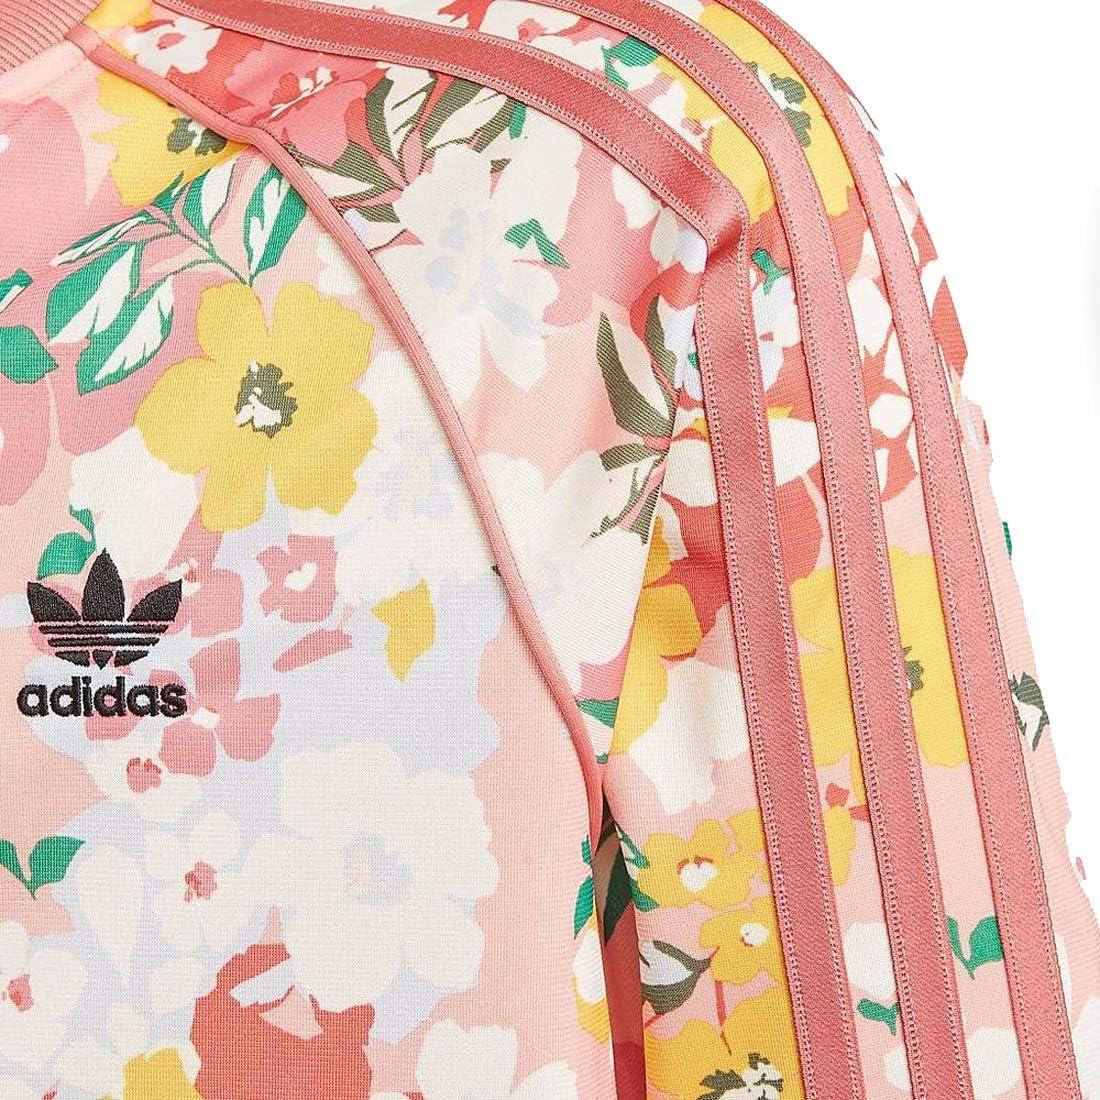 adidas Originals Unisex-Youth SST Top